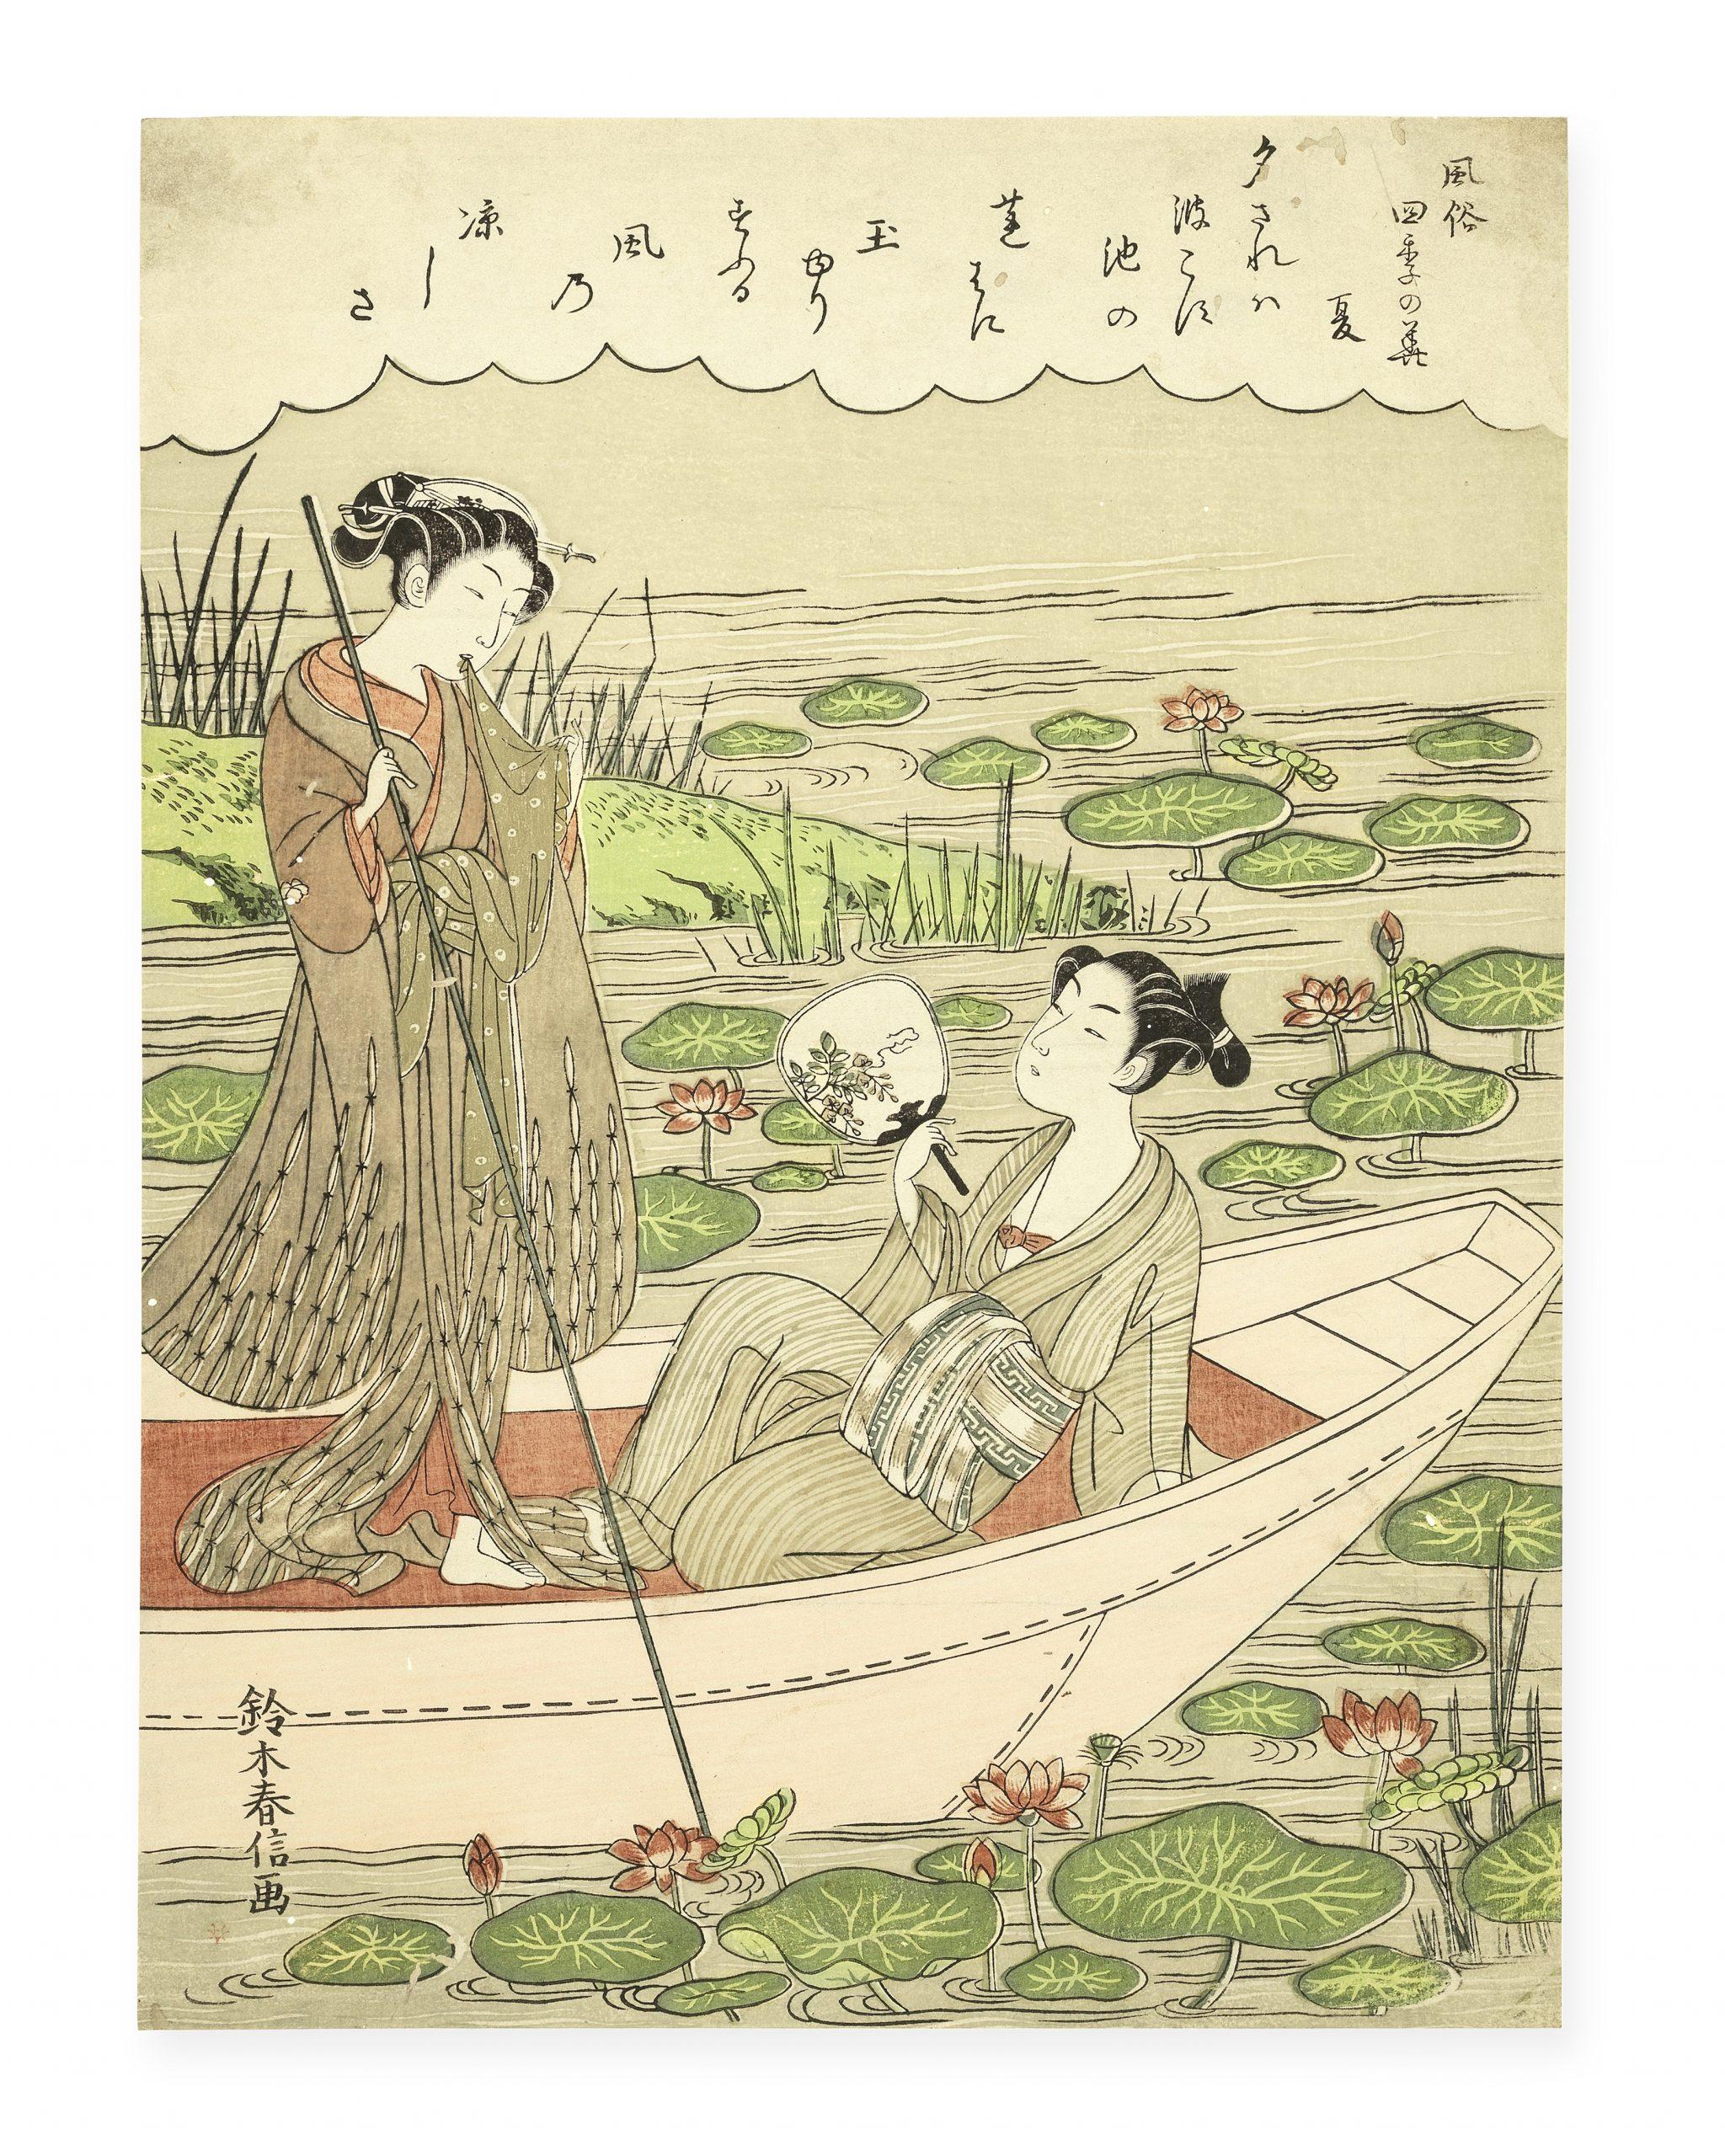 An extremely rare aiban print of Natsu (Summer) from the series Fuzoku shiki no hana (Fashionable Flowers of the Four Seasons), Suzuki Harunobu (1725-1770), Edo Period, circa 1769-1770 - Snow, Sex and Spectacle